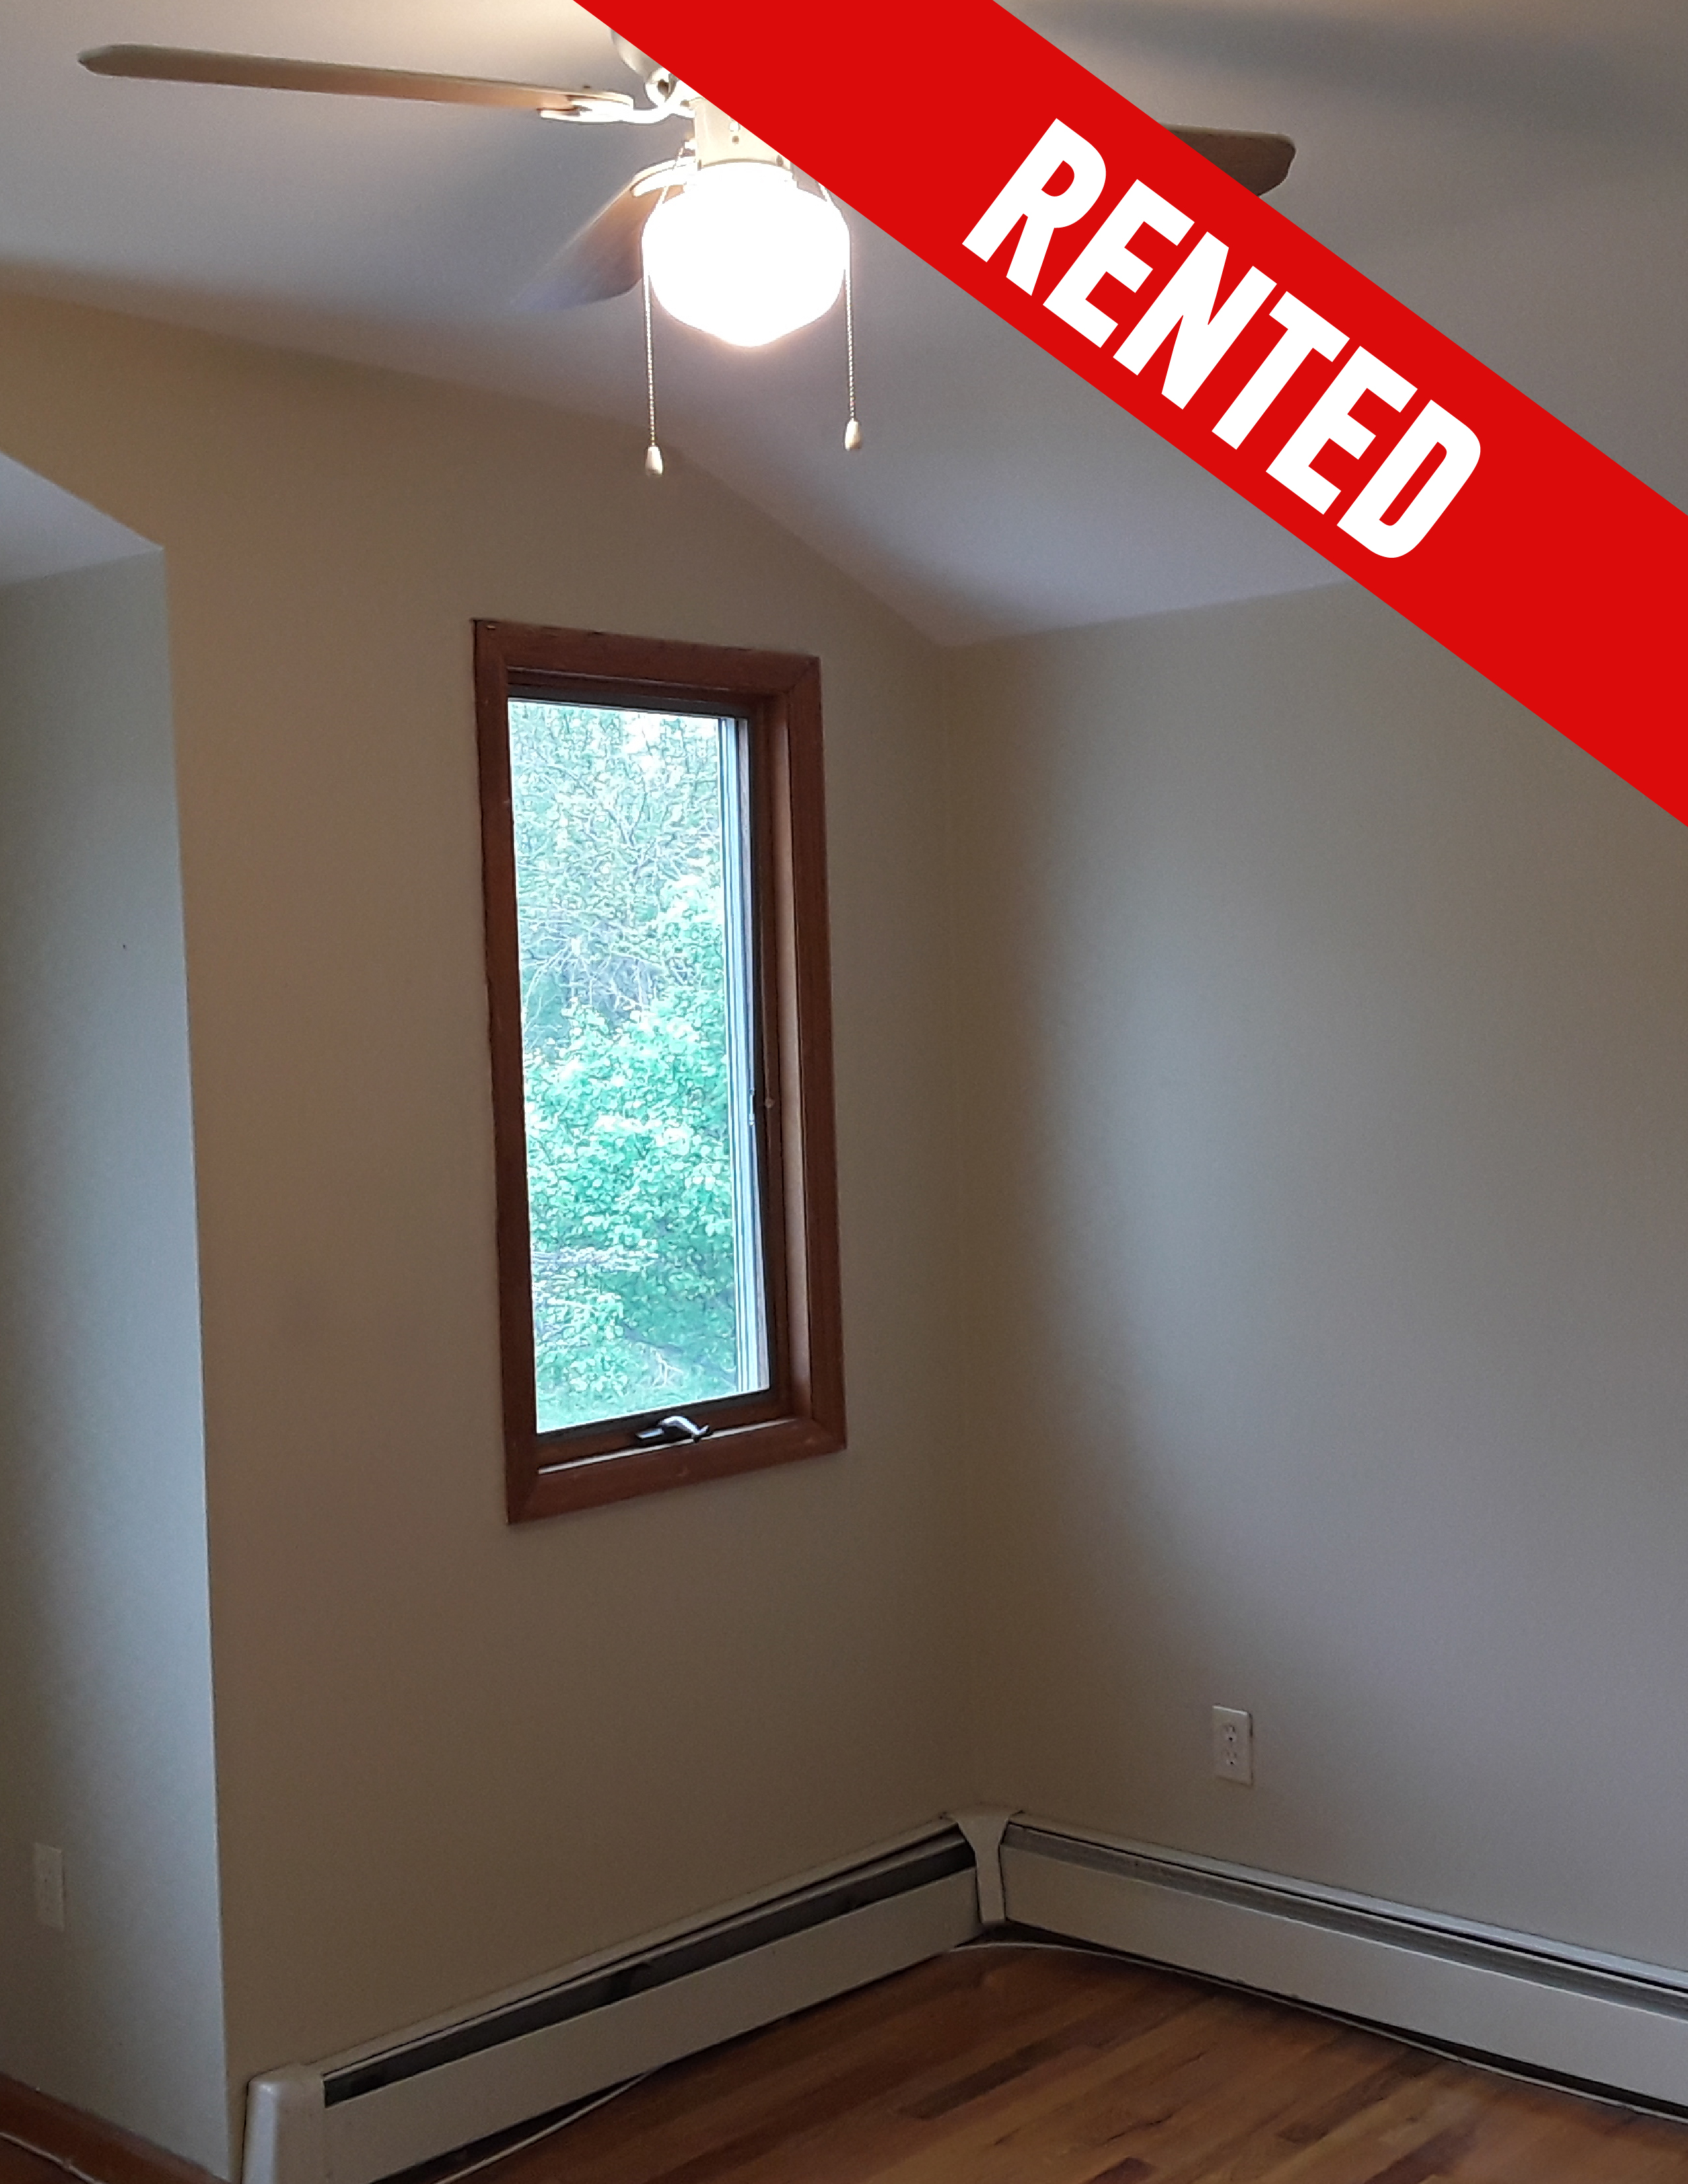 Home for sale: 500 SHELDON AVENUE, STATEN ISLAND, NY